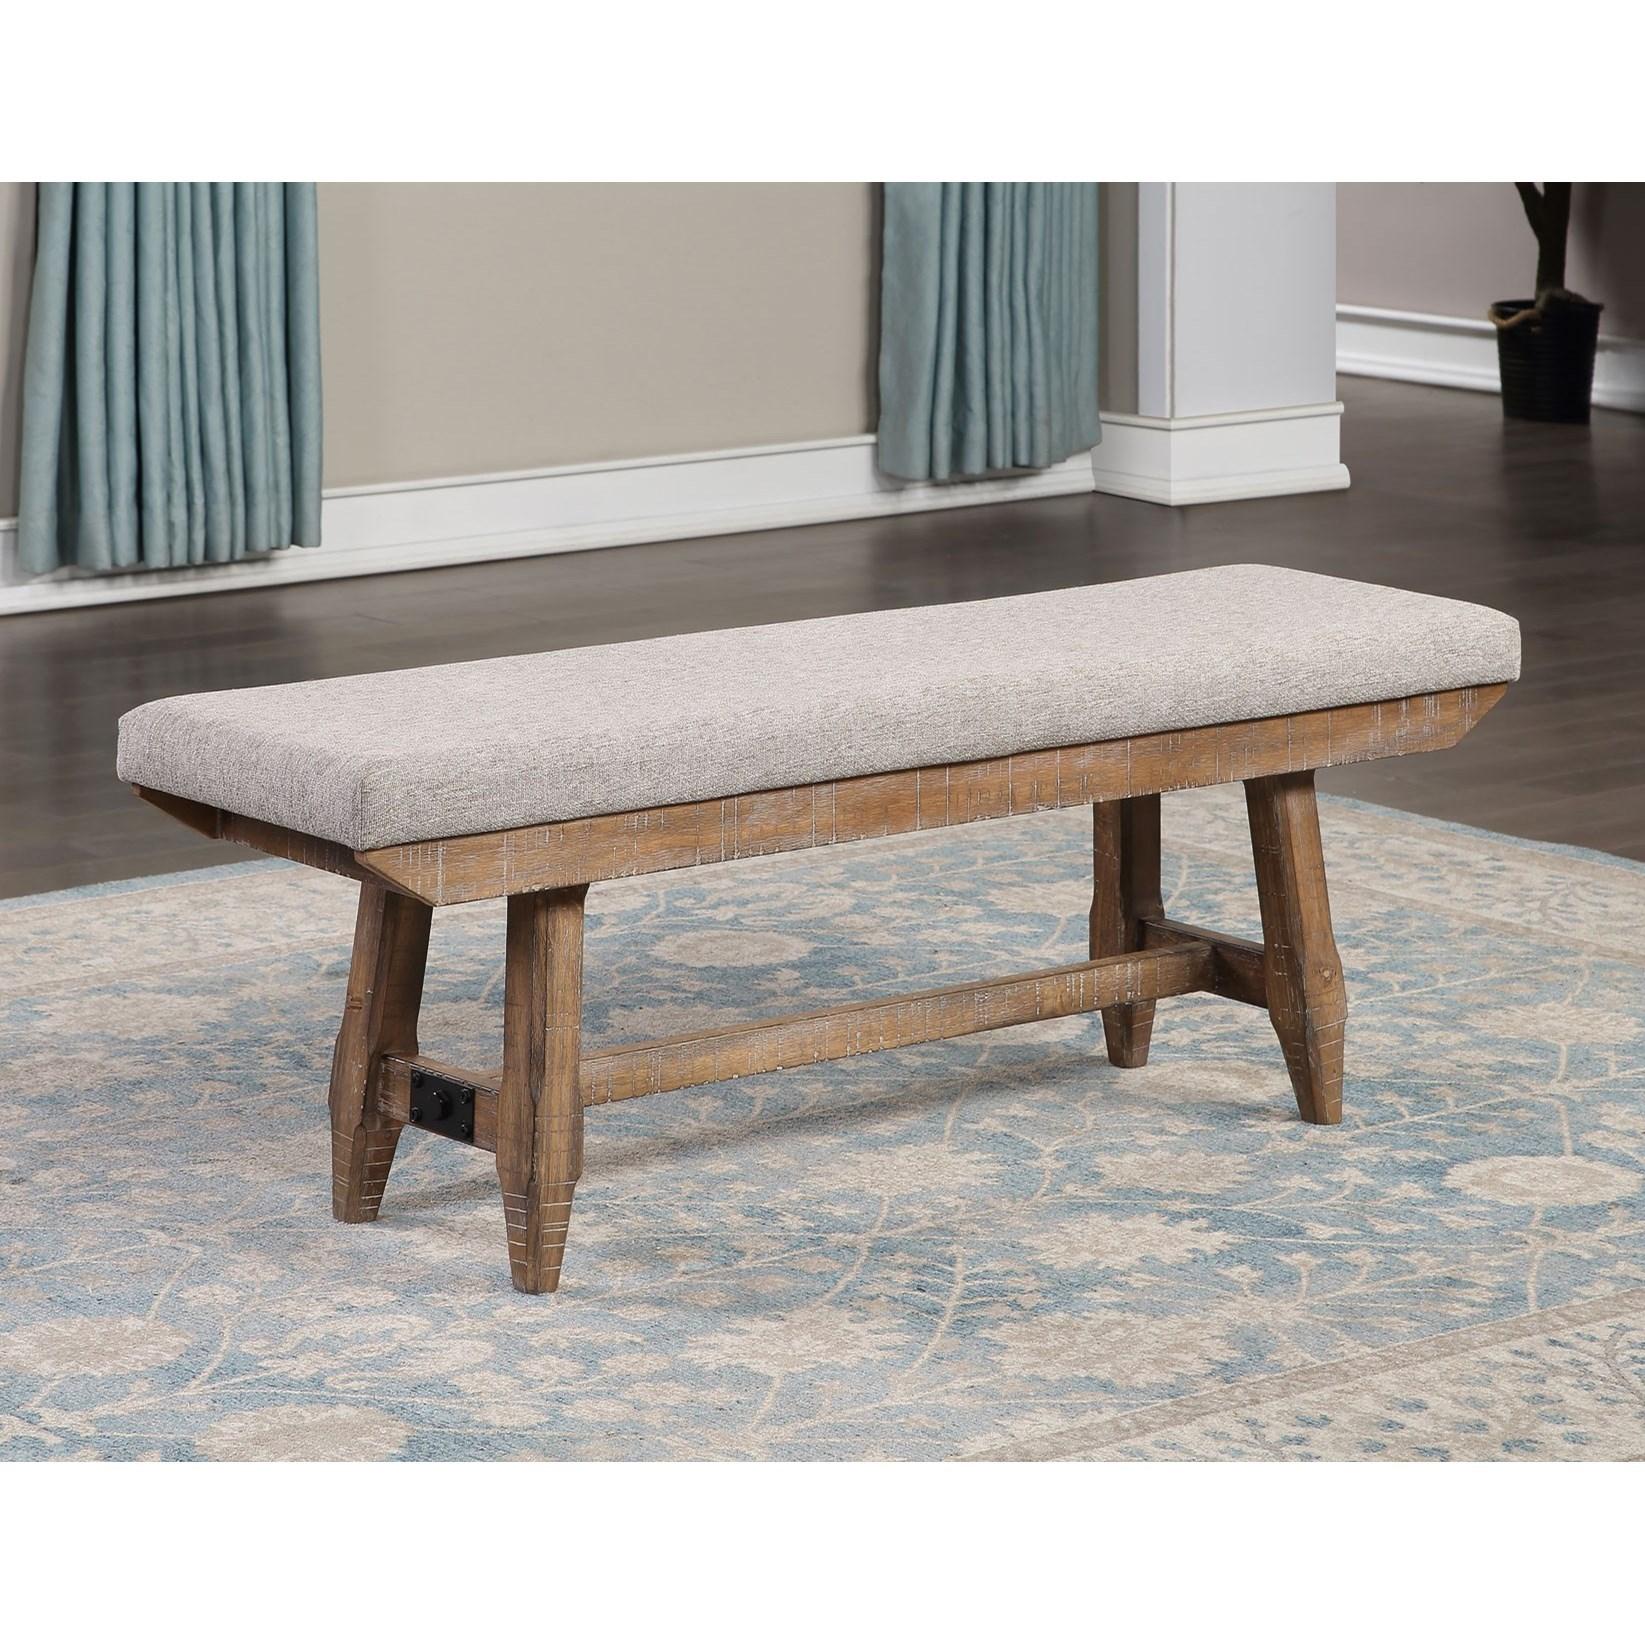 Riverdale Bench by Steve Silver at Walker's Furniture